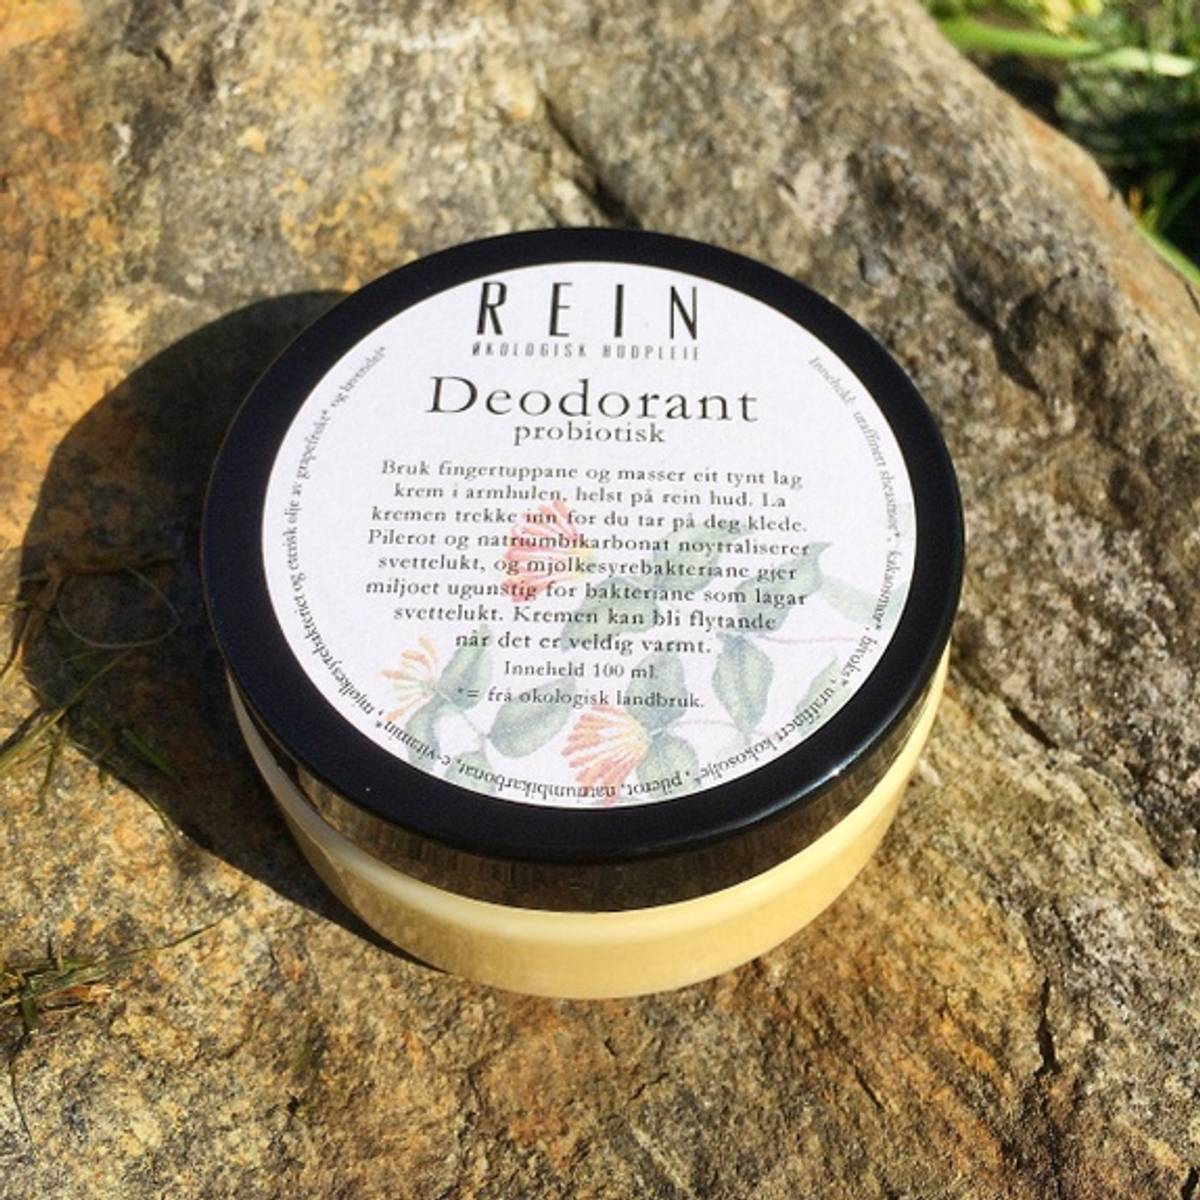 Rein deodorant 75 ml Naturell